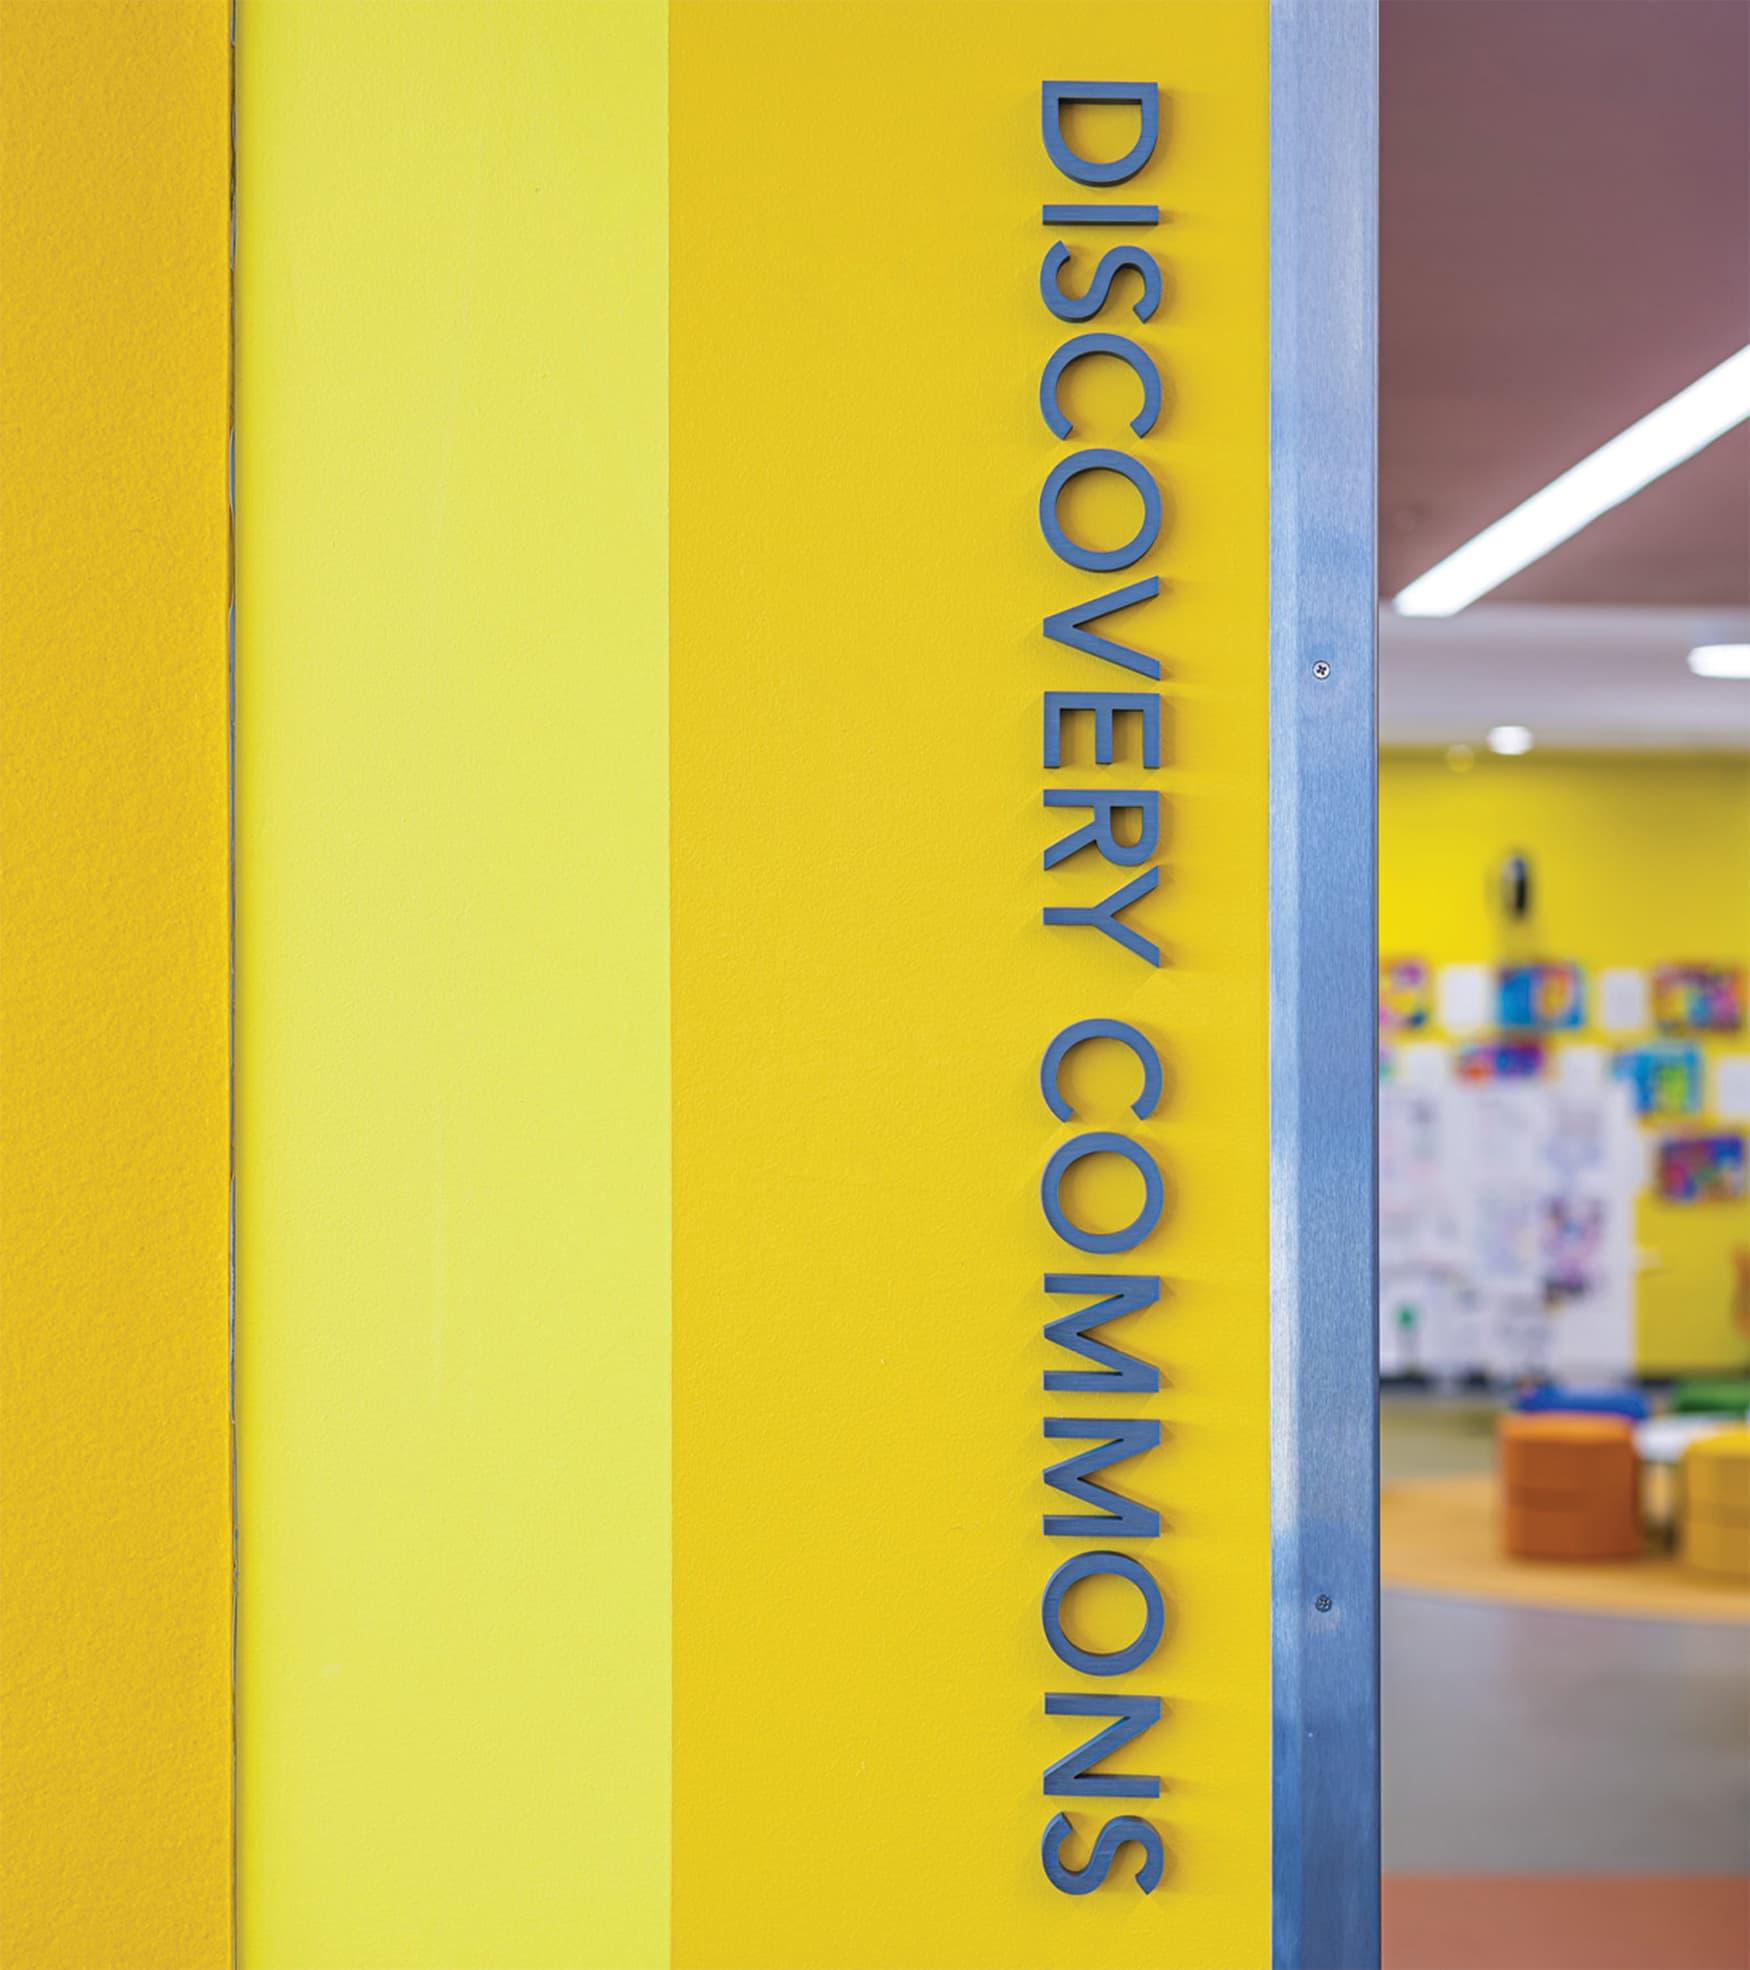 Education Interior Room Identity Signage